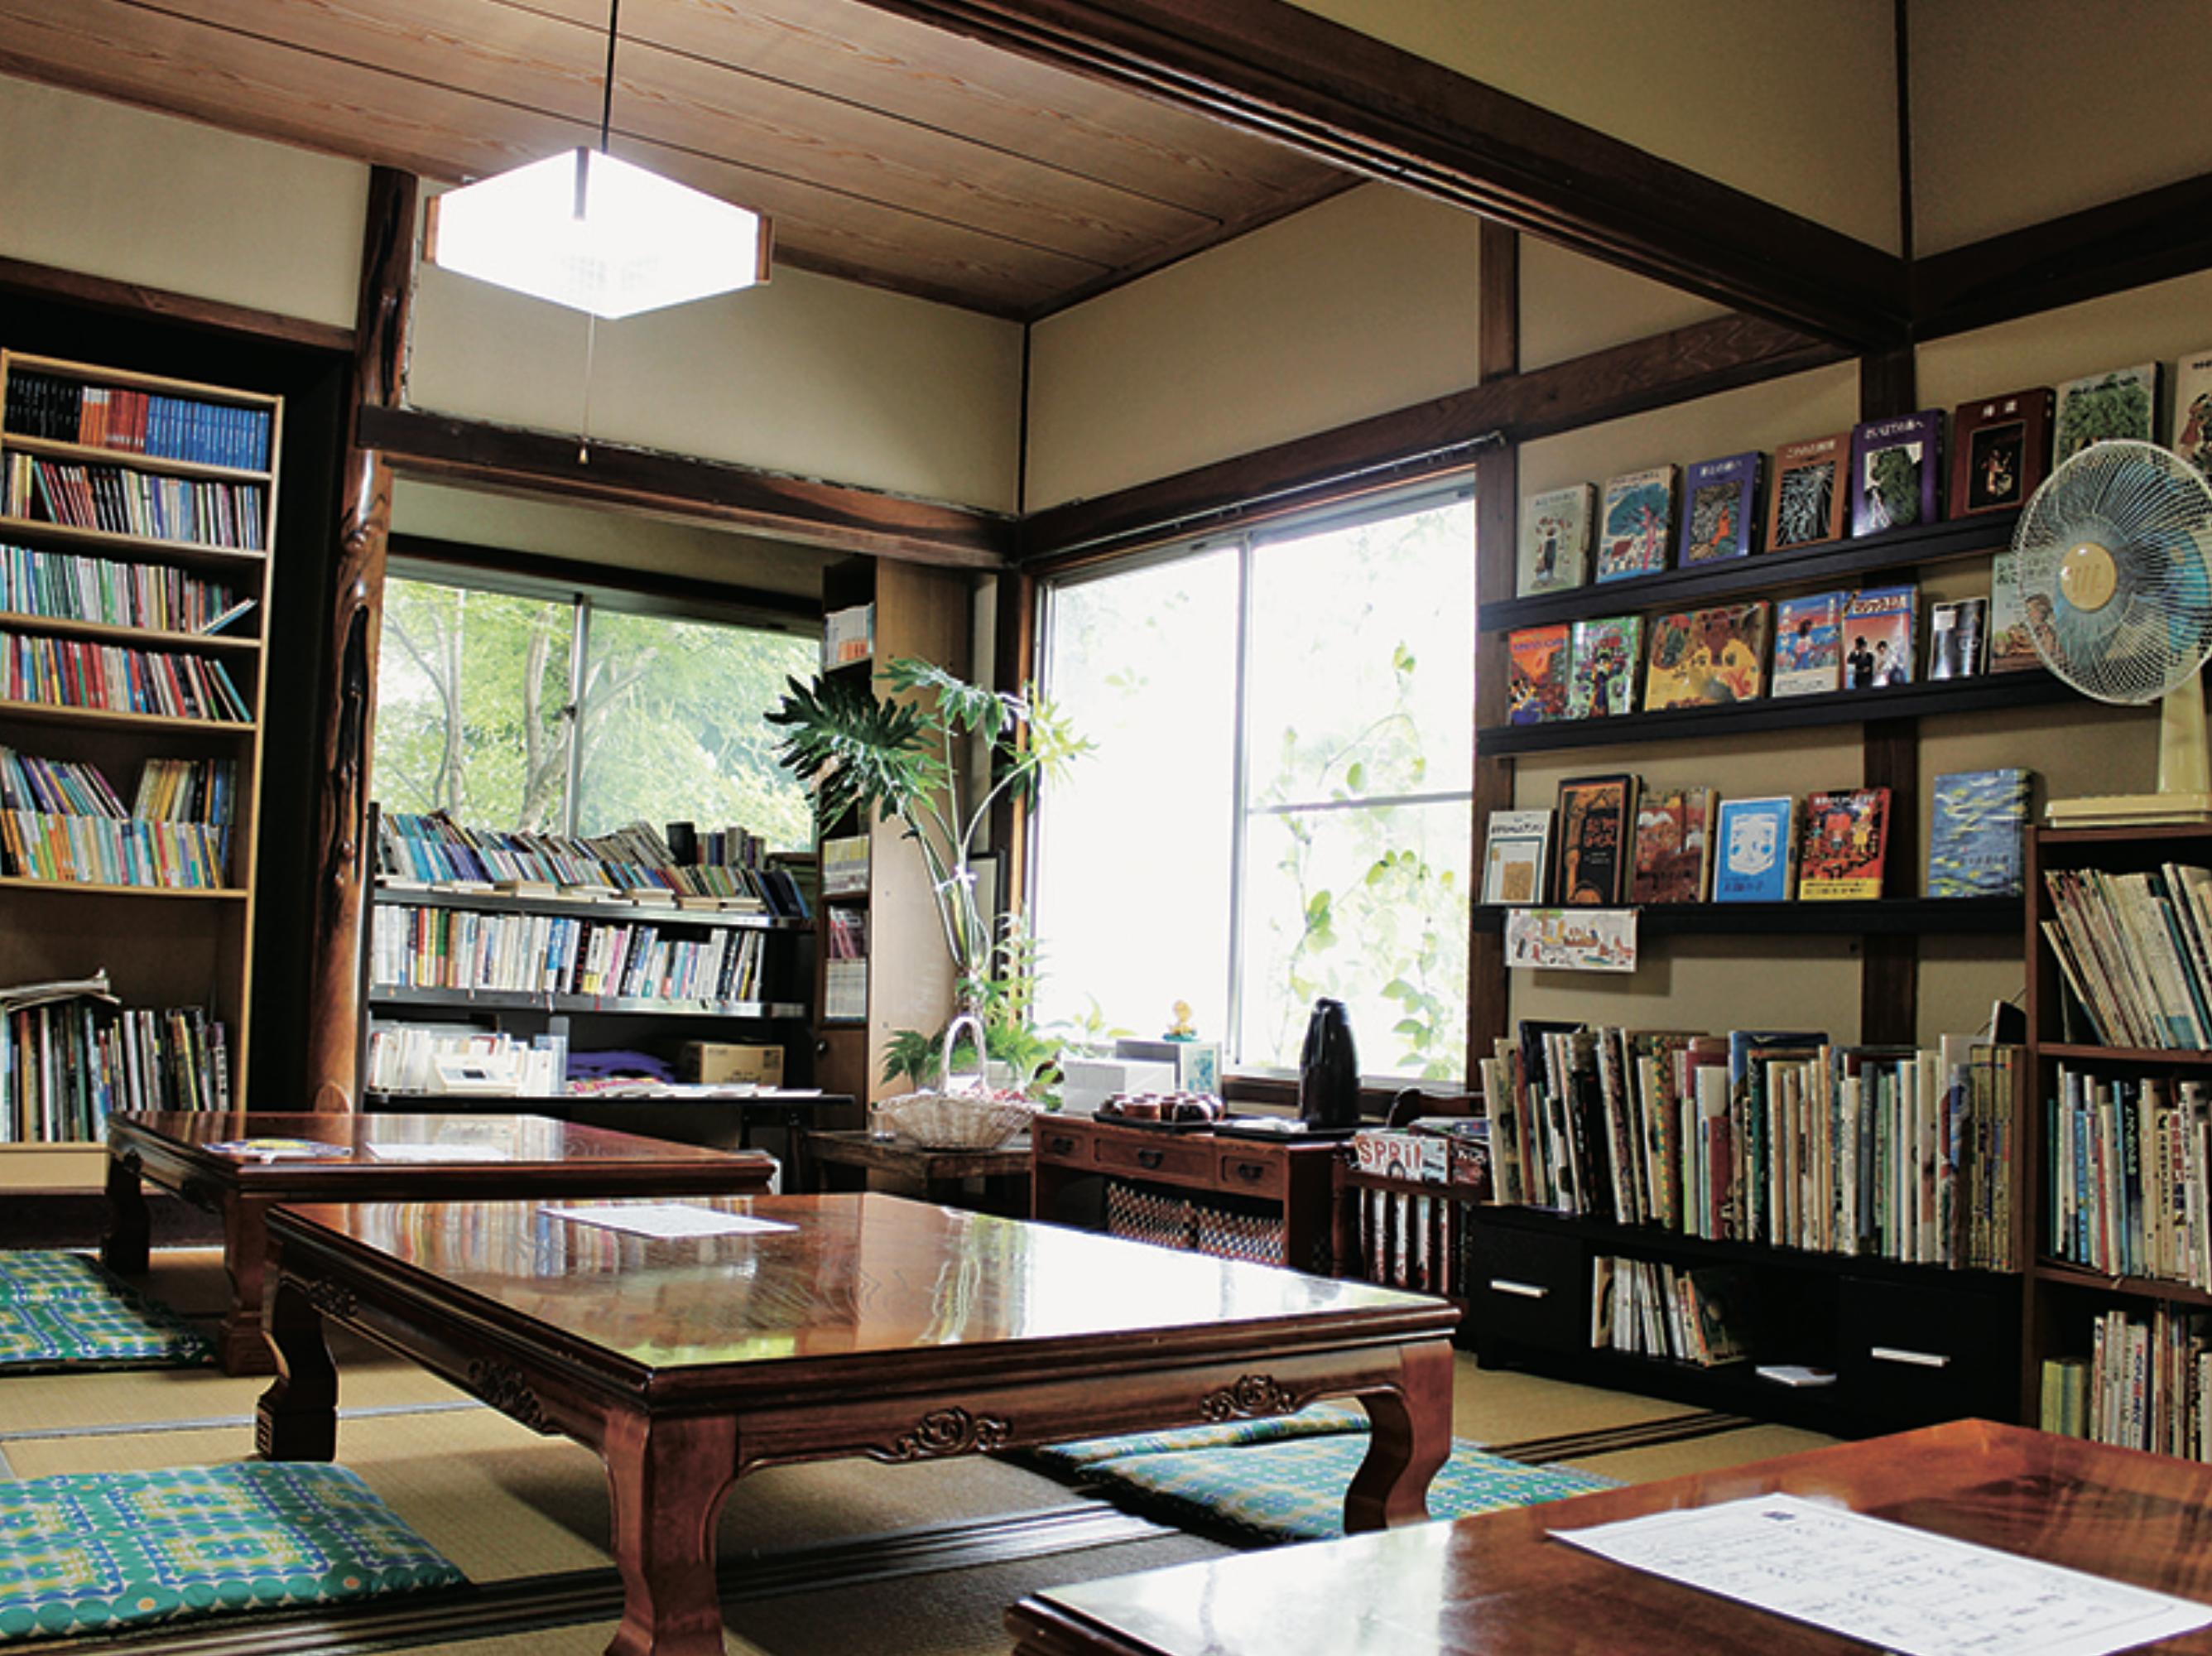 tag 信夫山公園 とうほうみんなの文化センター カフェ